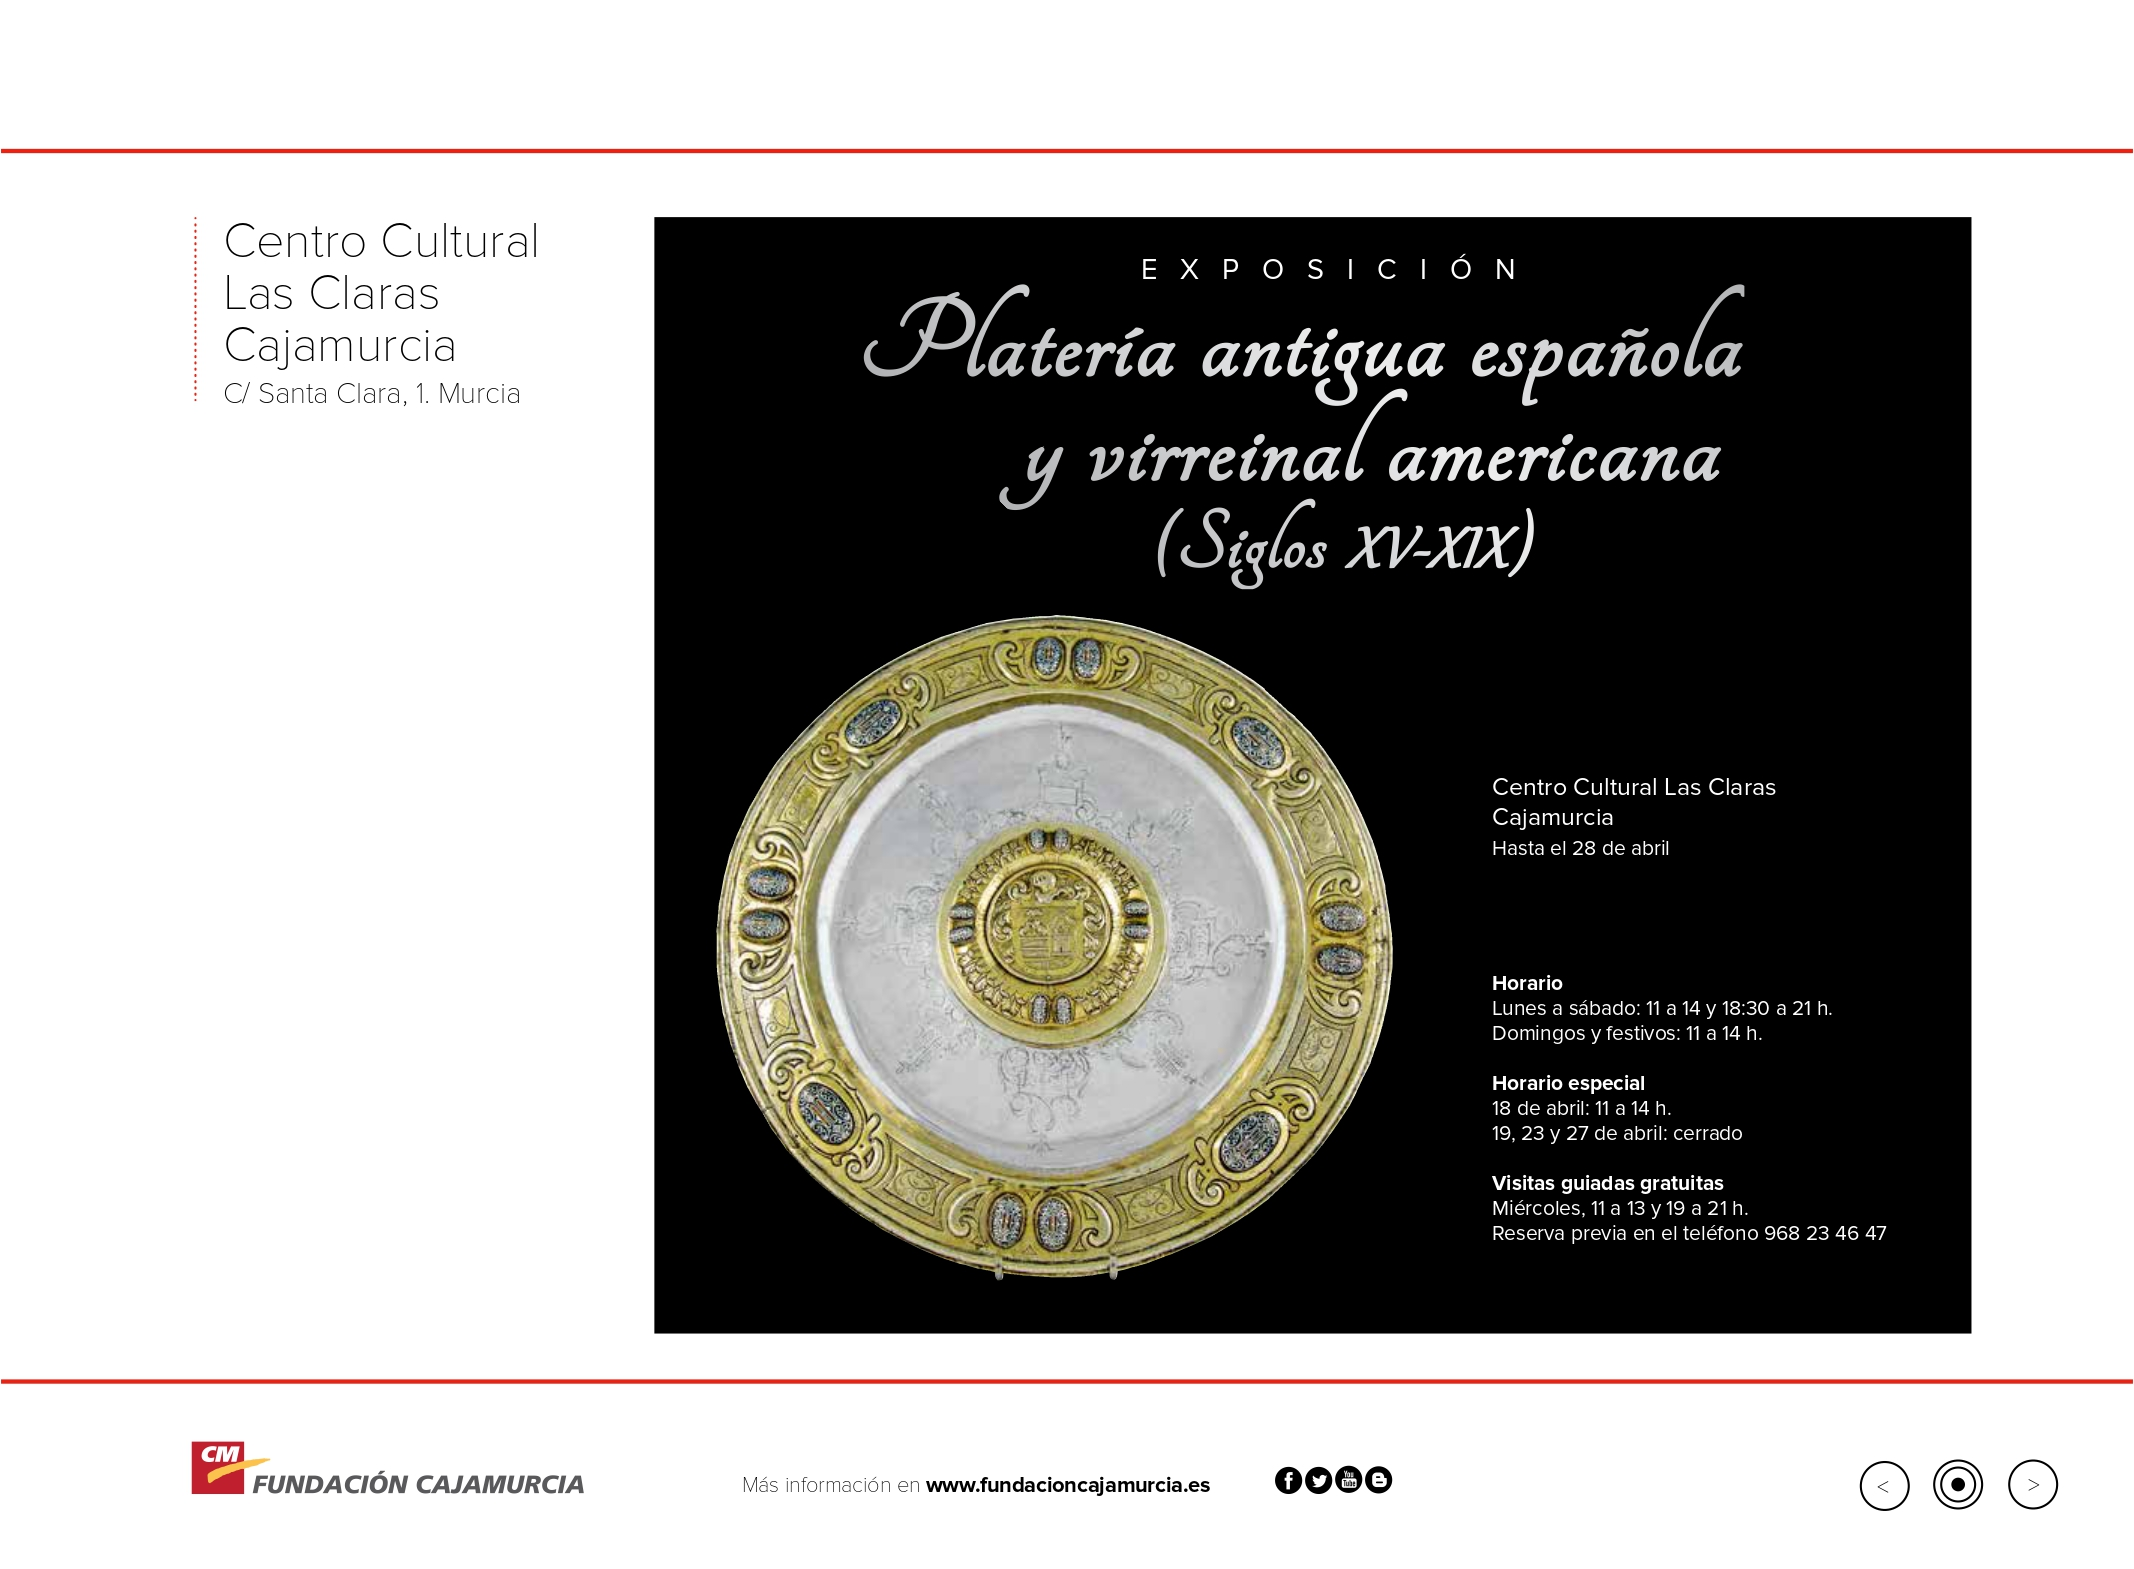 agenda-cajamurcia_page-0004.jpg